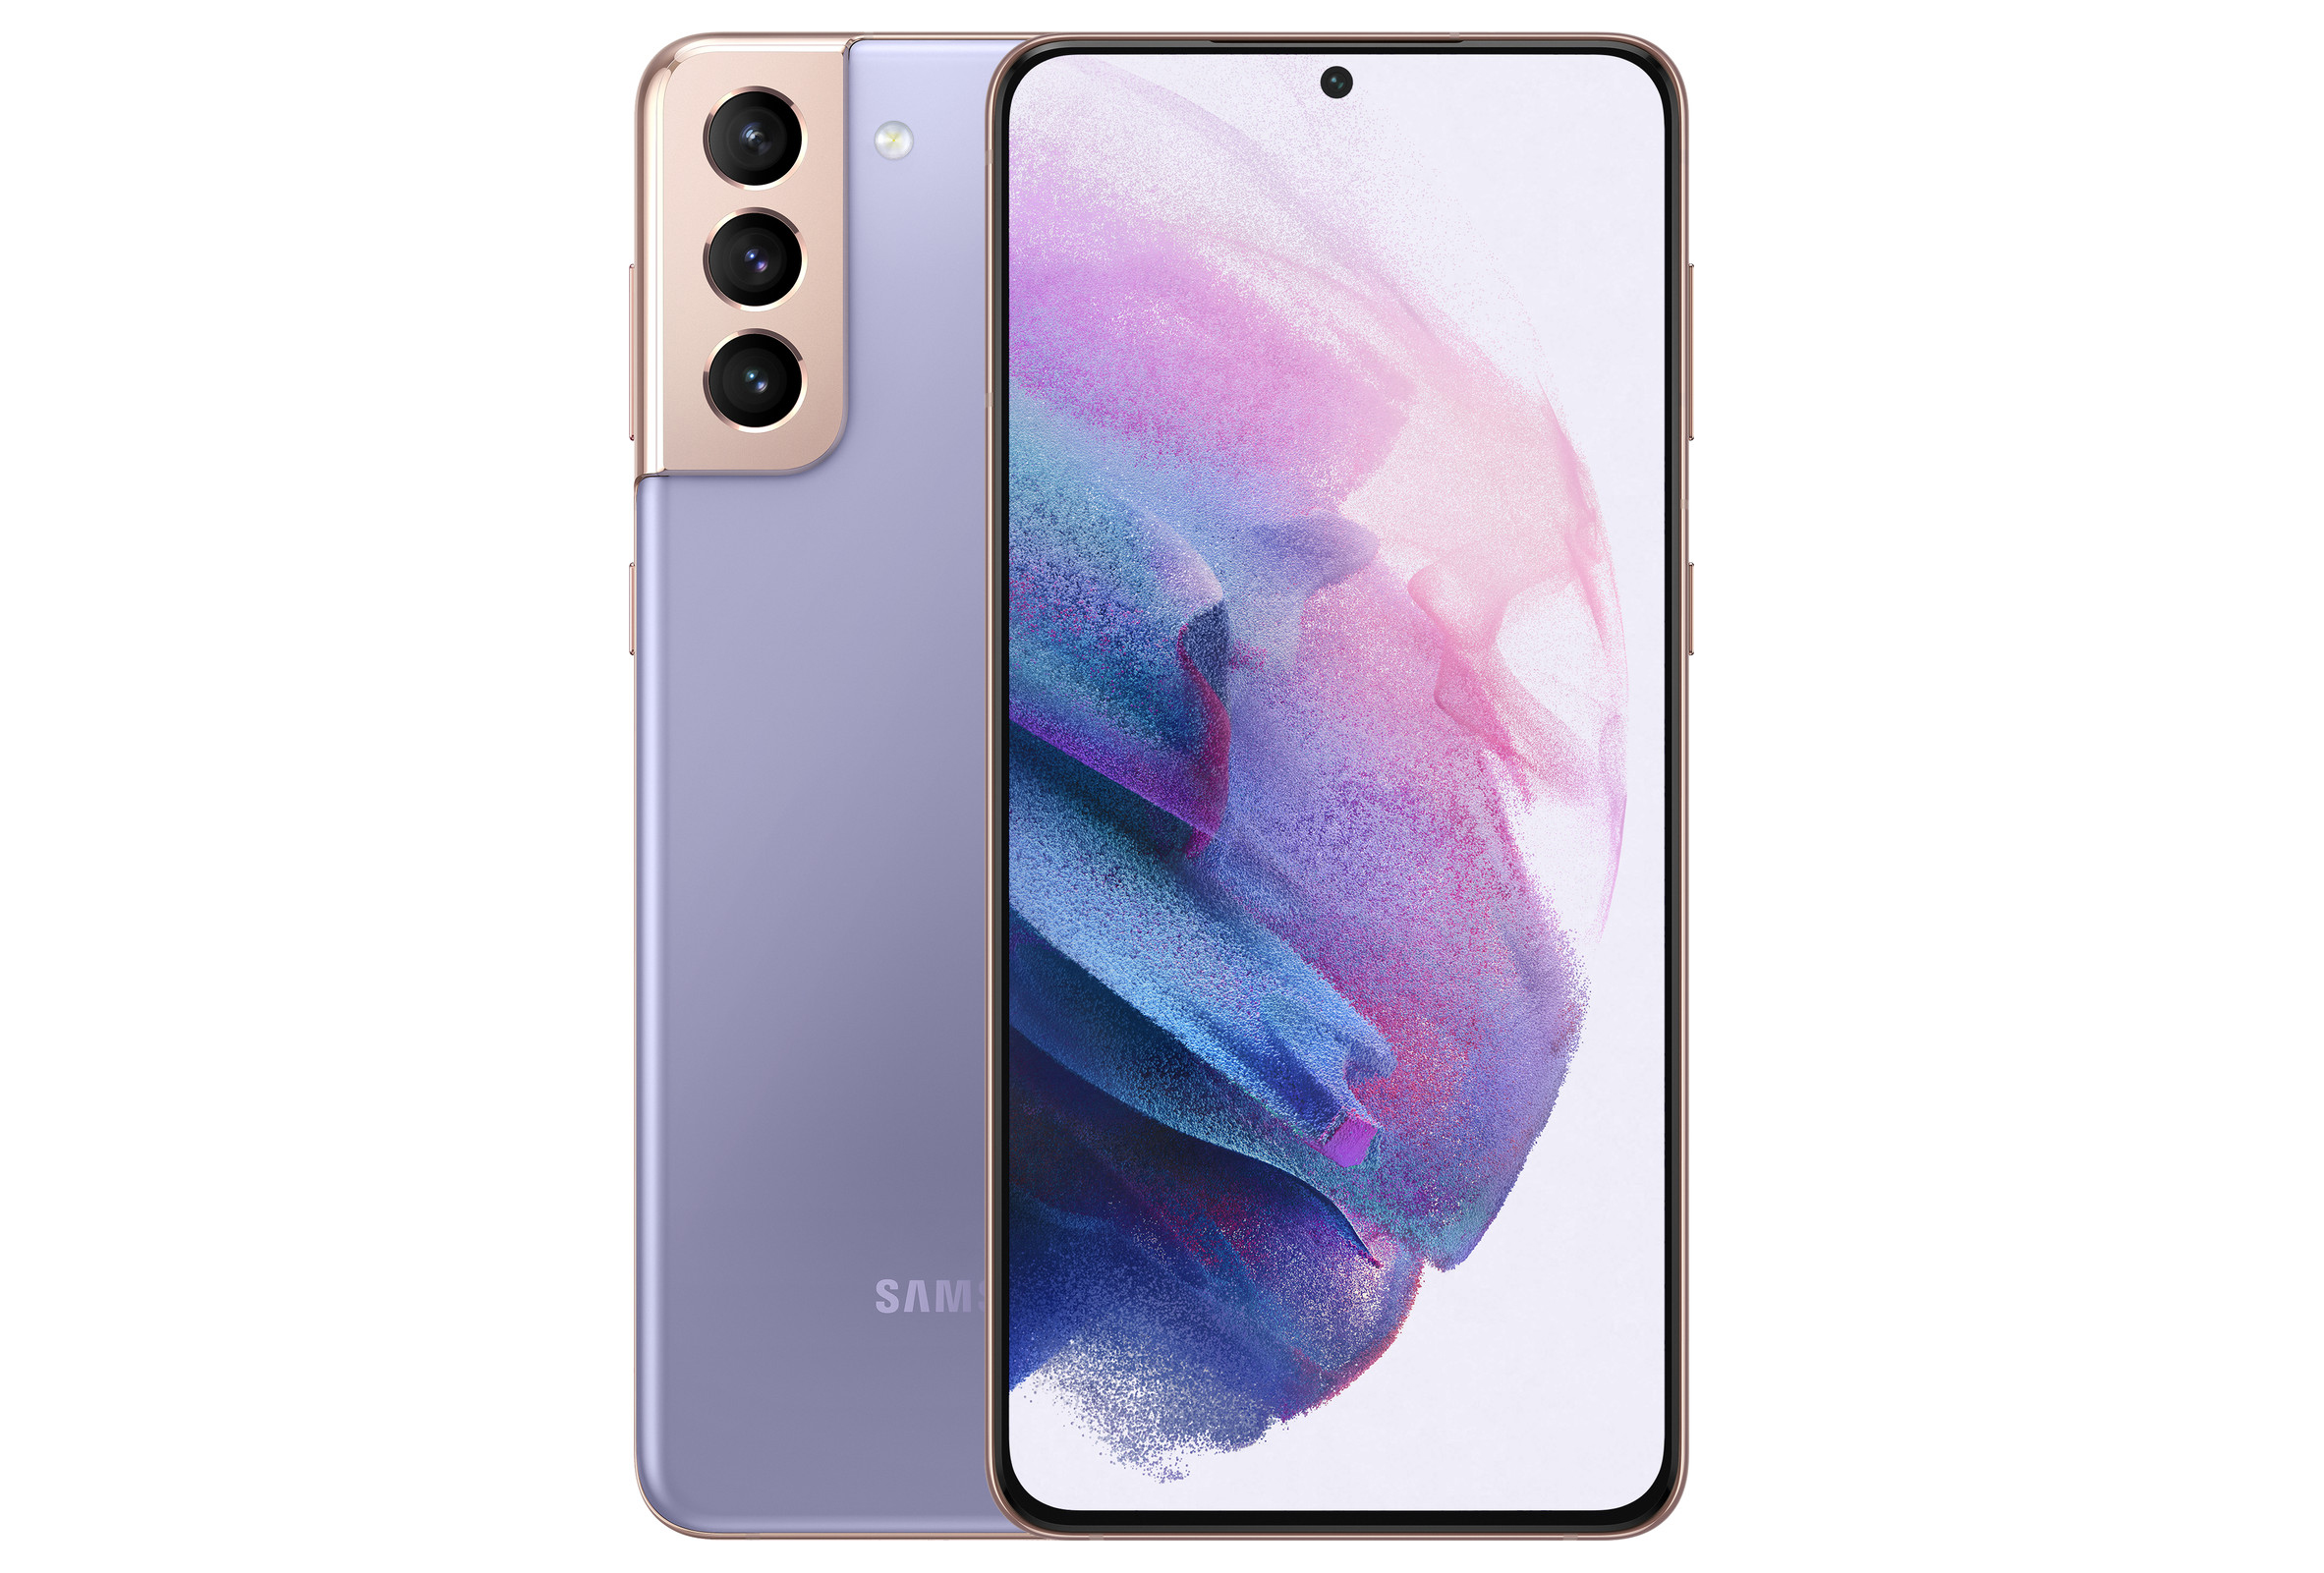 Samsung Galaxy S21 Plus 5G (128GB) – Paars